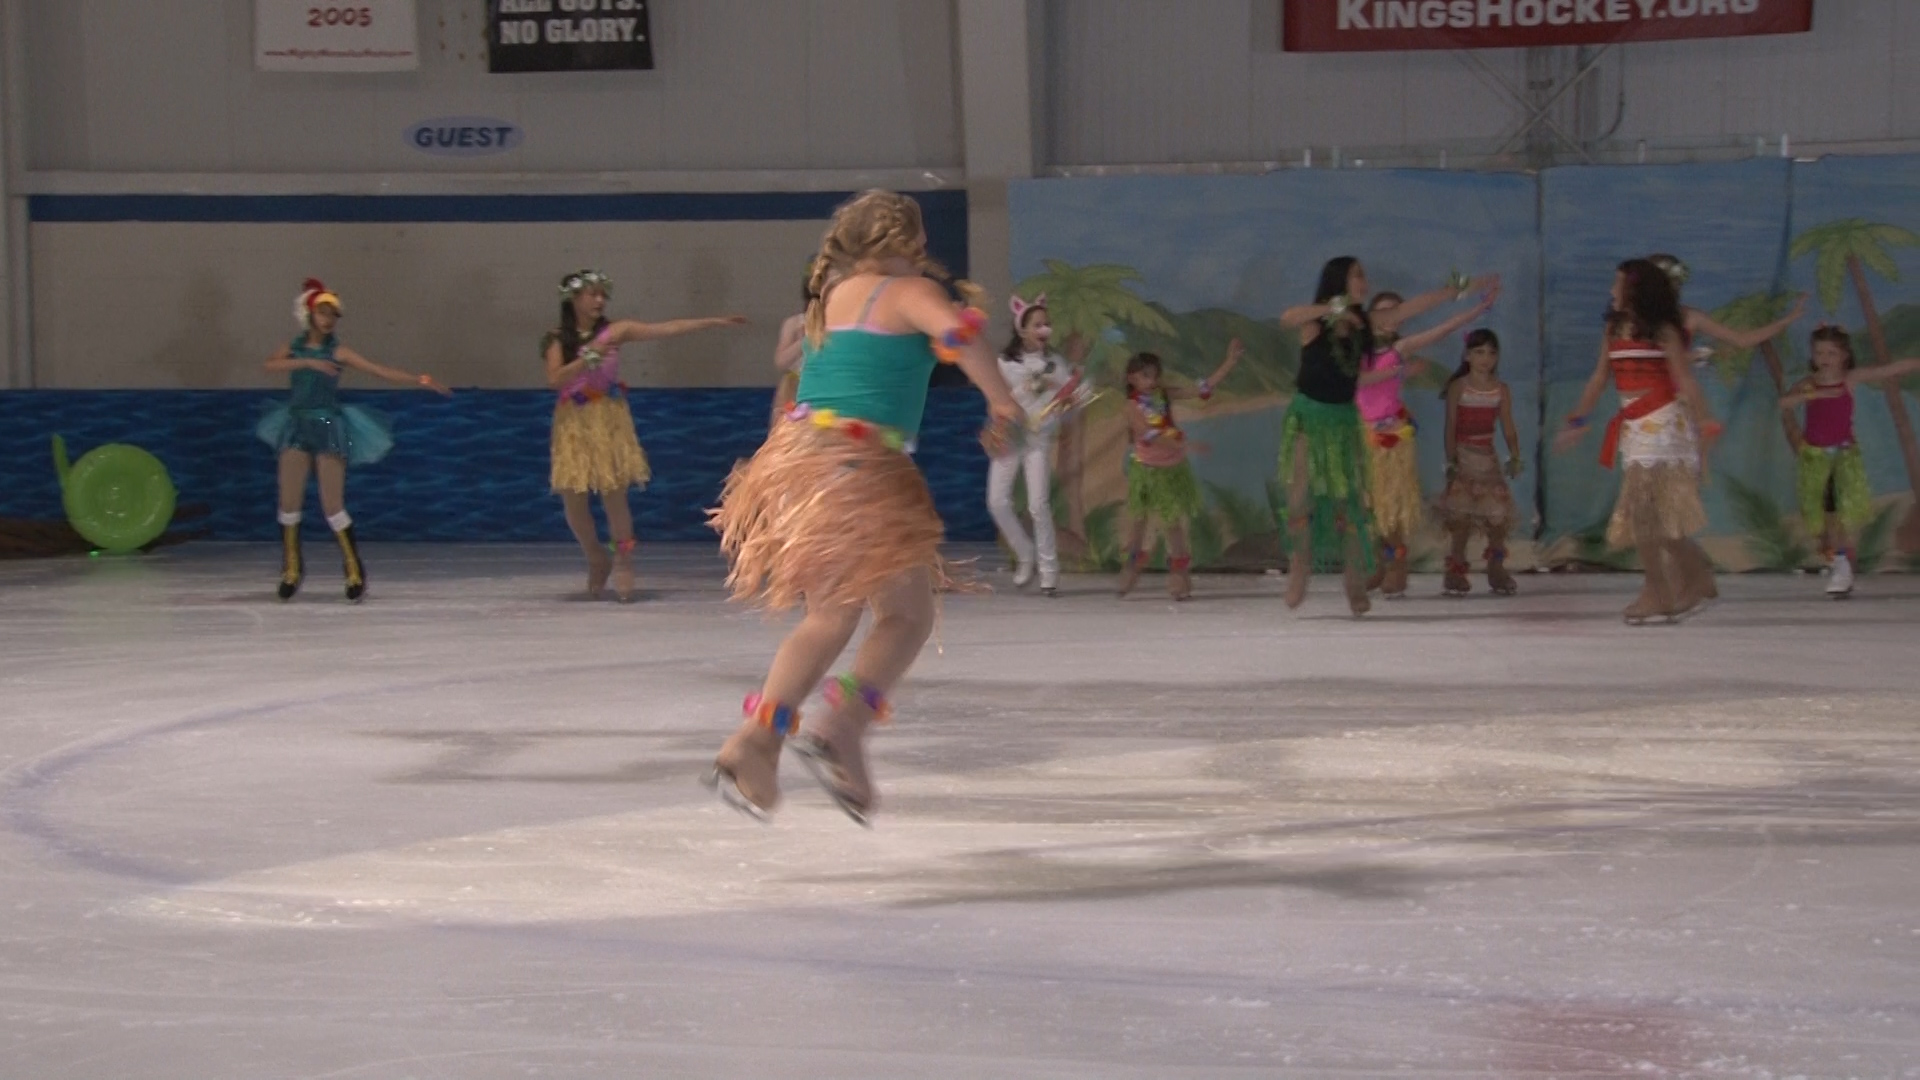 Power Play Maui Skate on Ice 071417.00_13_15_18.Still023.jpg